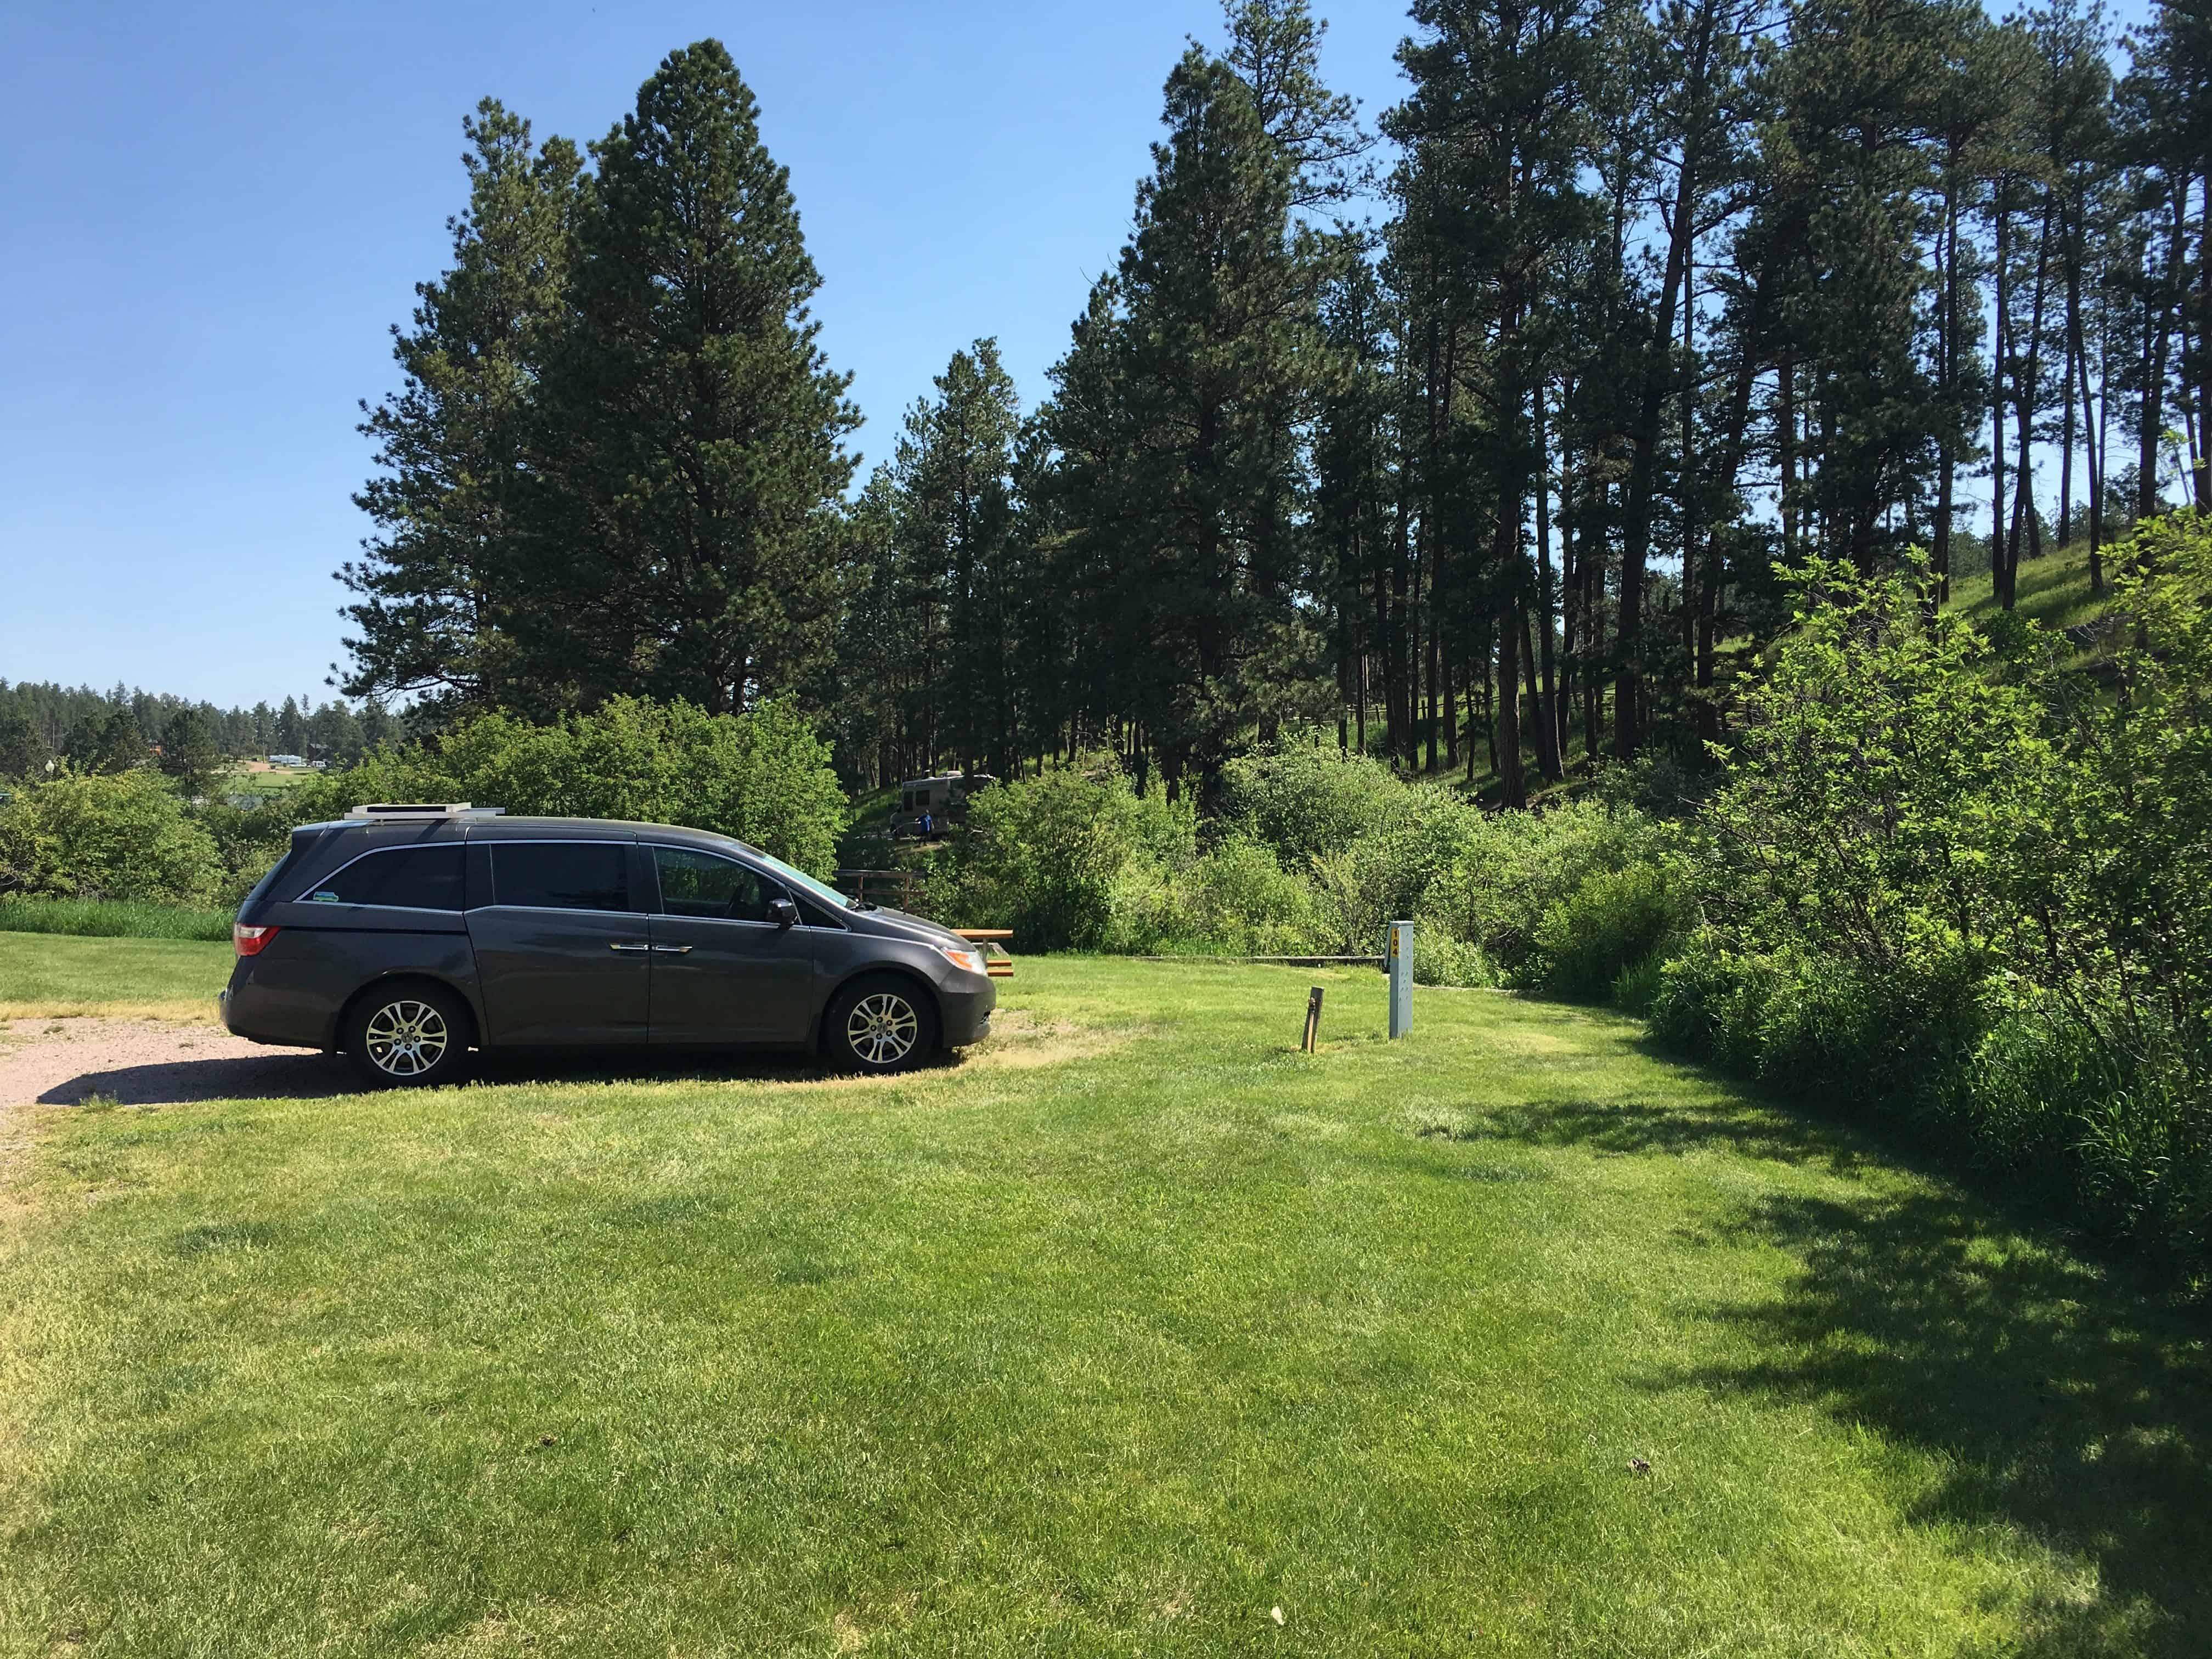 Honda Odyssey Tent - Best Camping Tents for Honda Odyssey ...